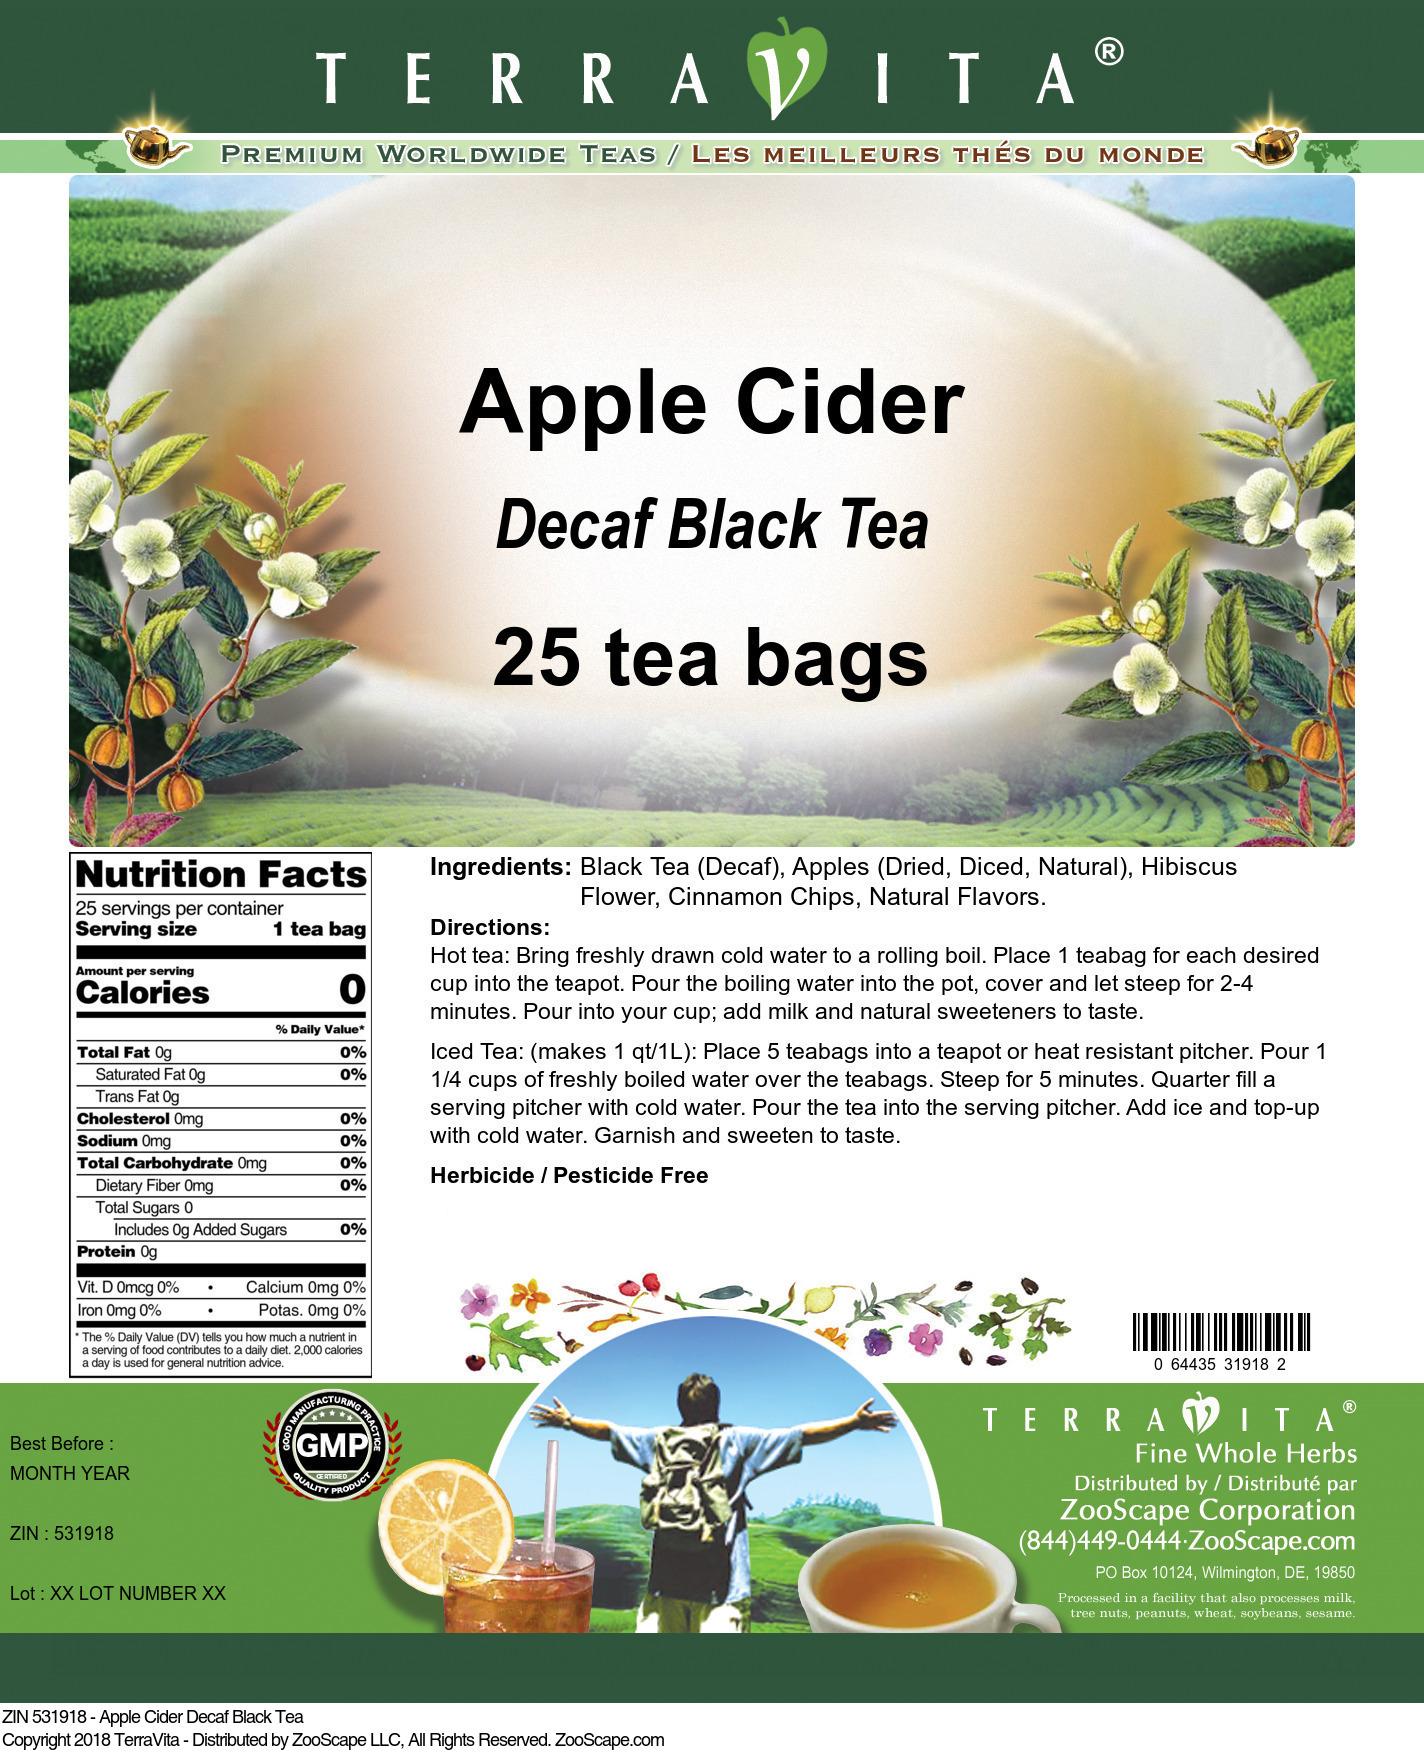 Apple Cider Decaf Black Tea